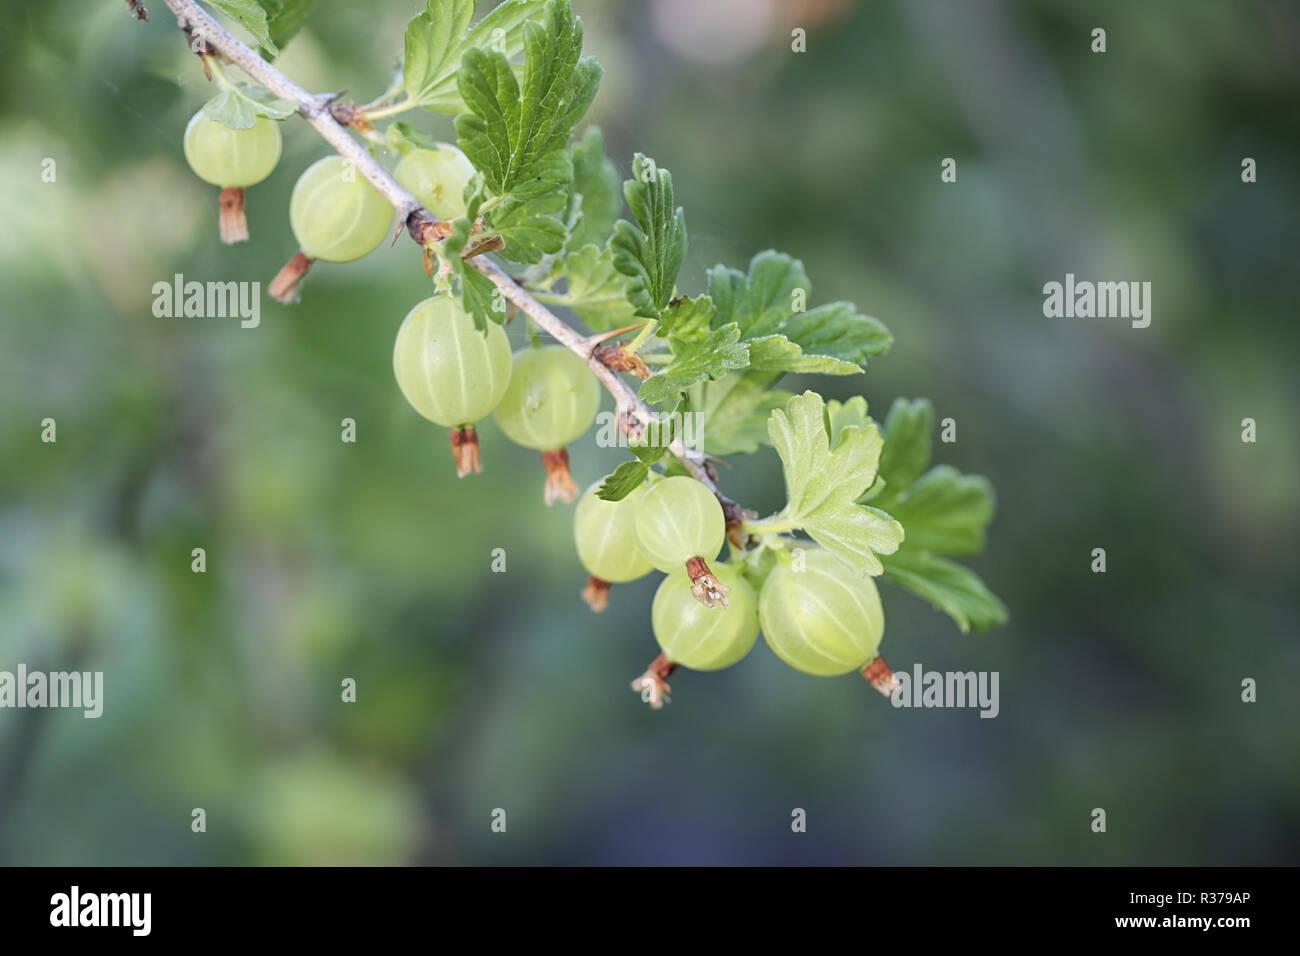 Gooseberry, Ribes uva-crispa - Stock Image